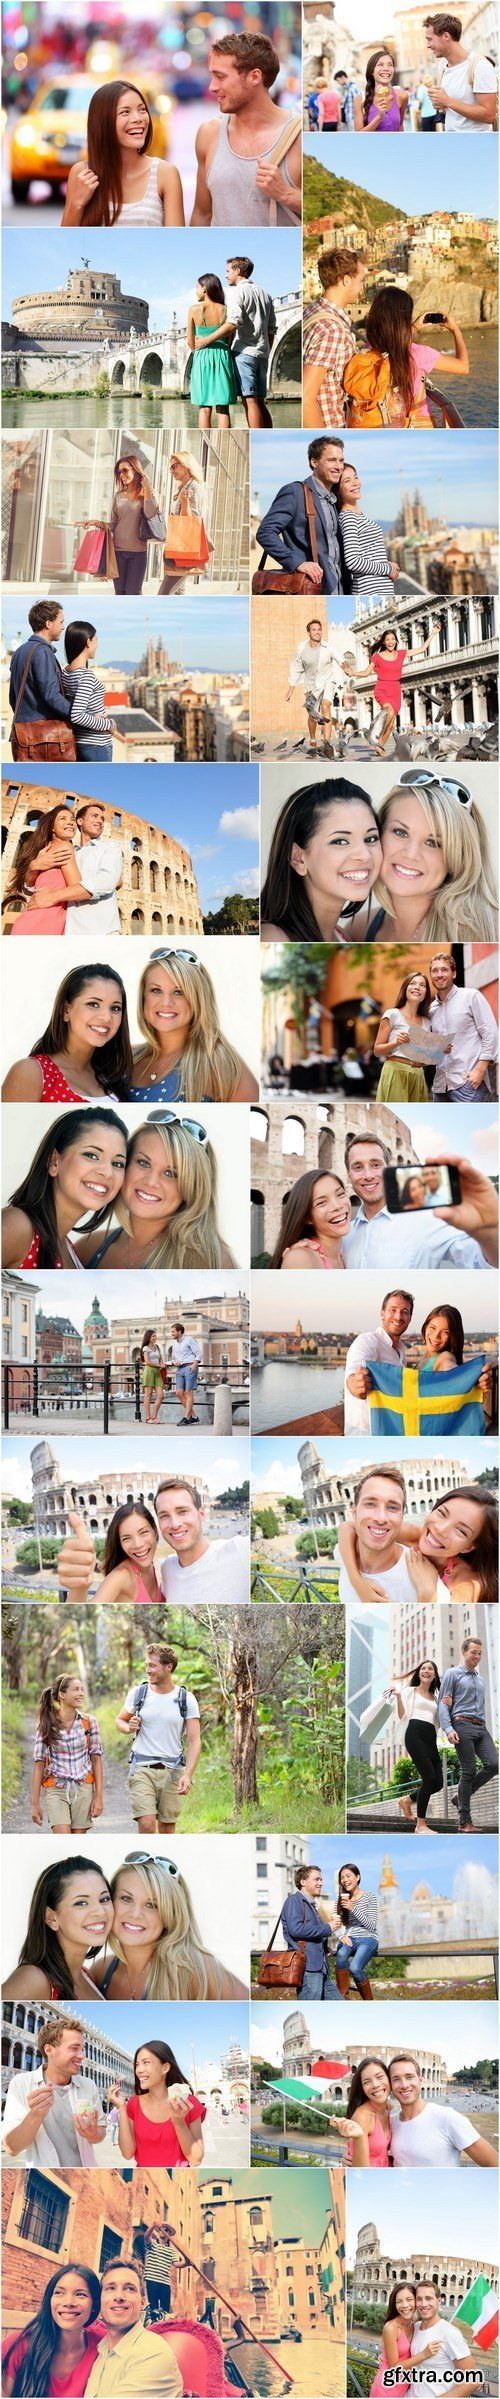 Selfie, Romantic travel - 26xHQ JPEG